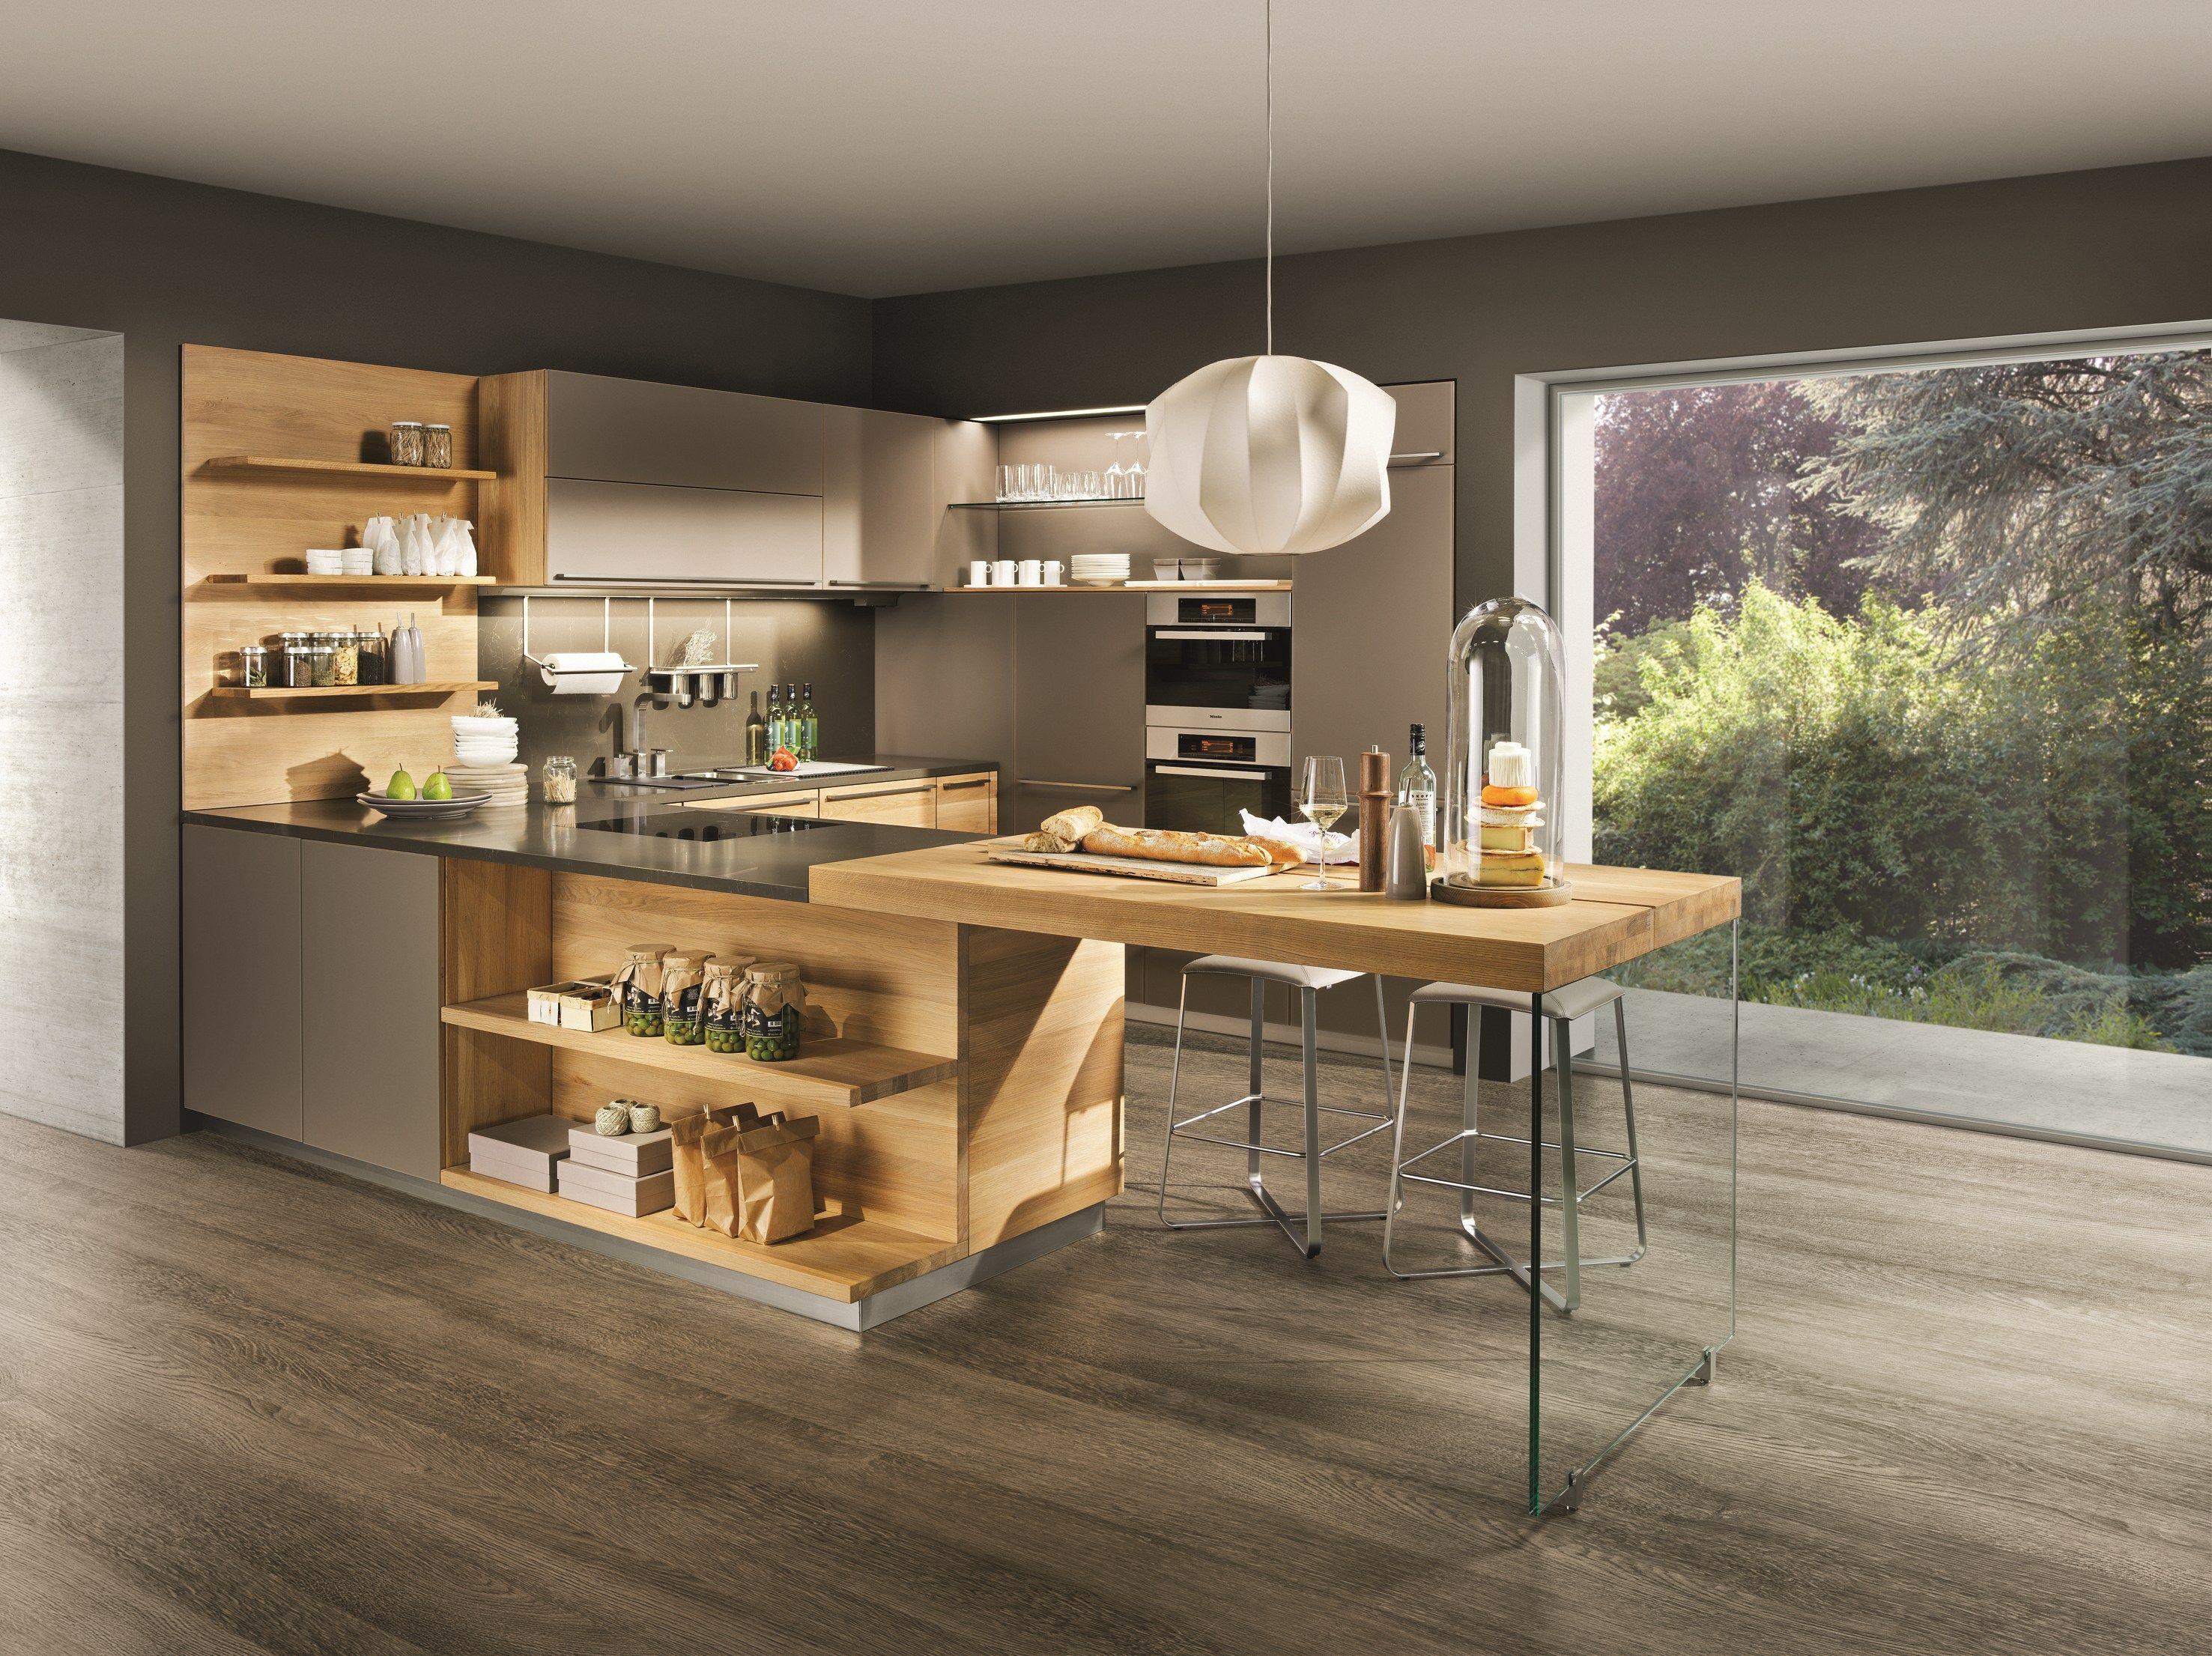 Cuisine int gr e en bois massif linee by team 7 nat rlich for Cuisine integree bois